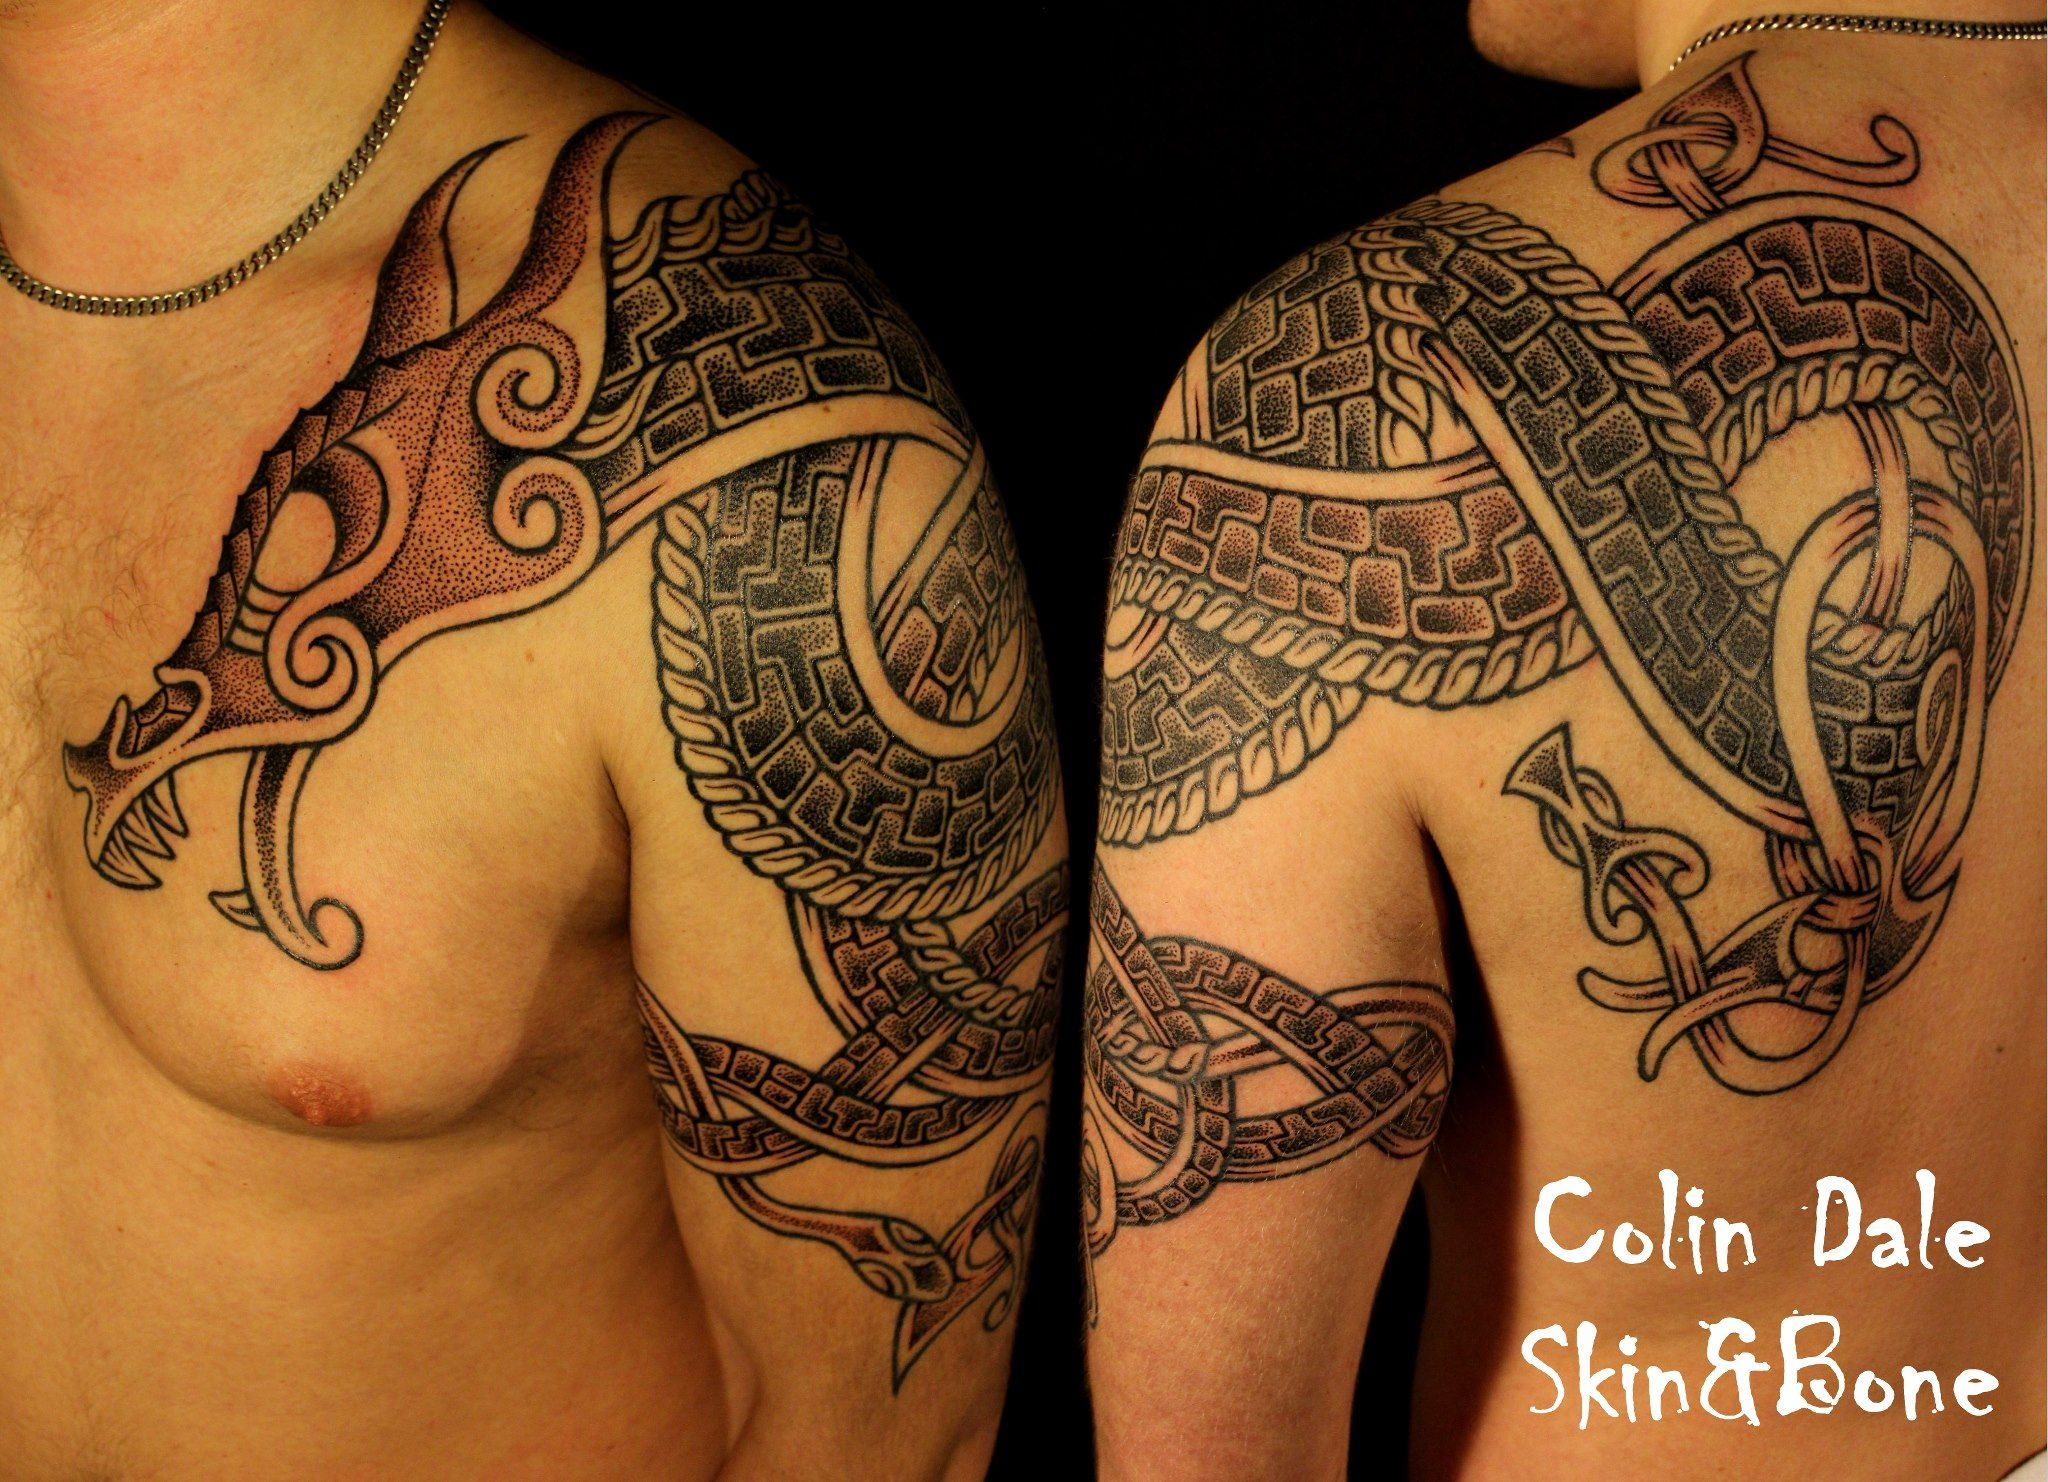 Pics For Gt Viking Dragon Tattoo Viking Dragon Tattoo Celtic Dragon Tattoos Dragon Tattoo